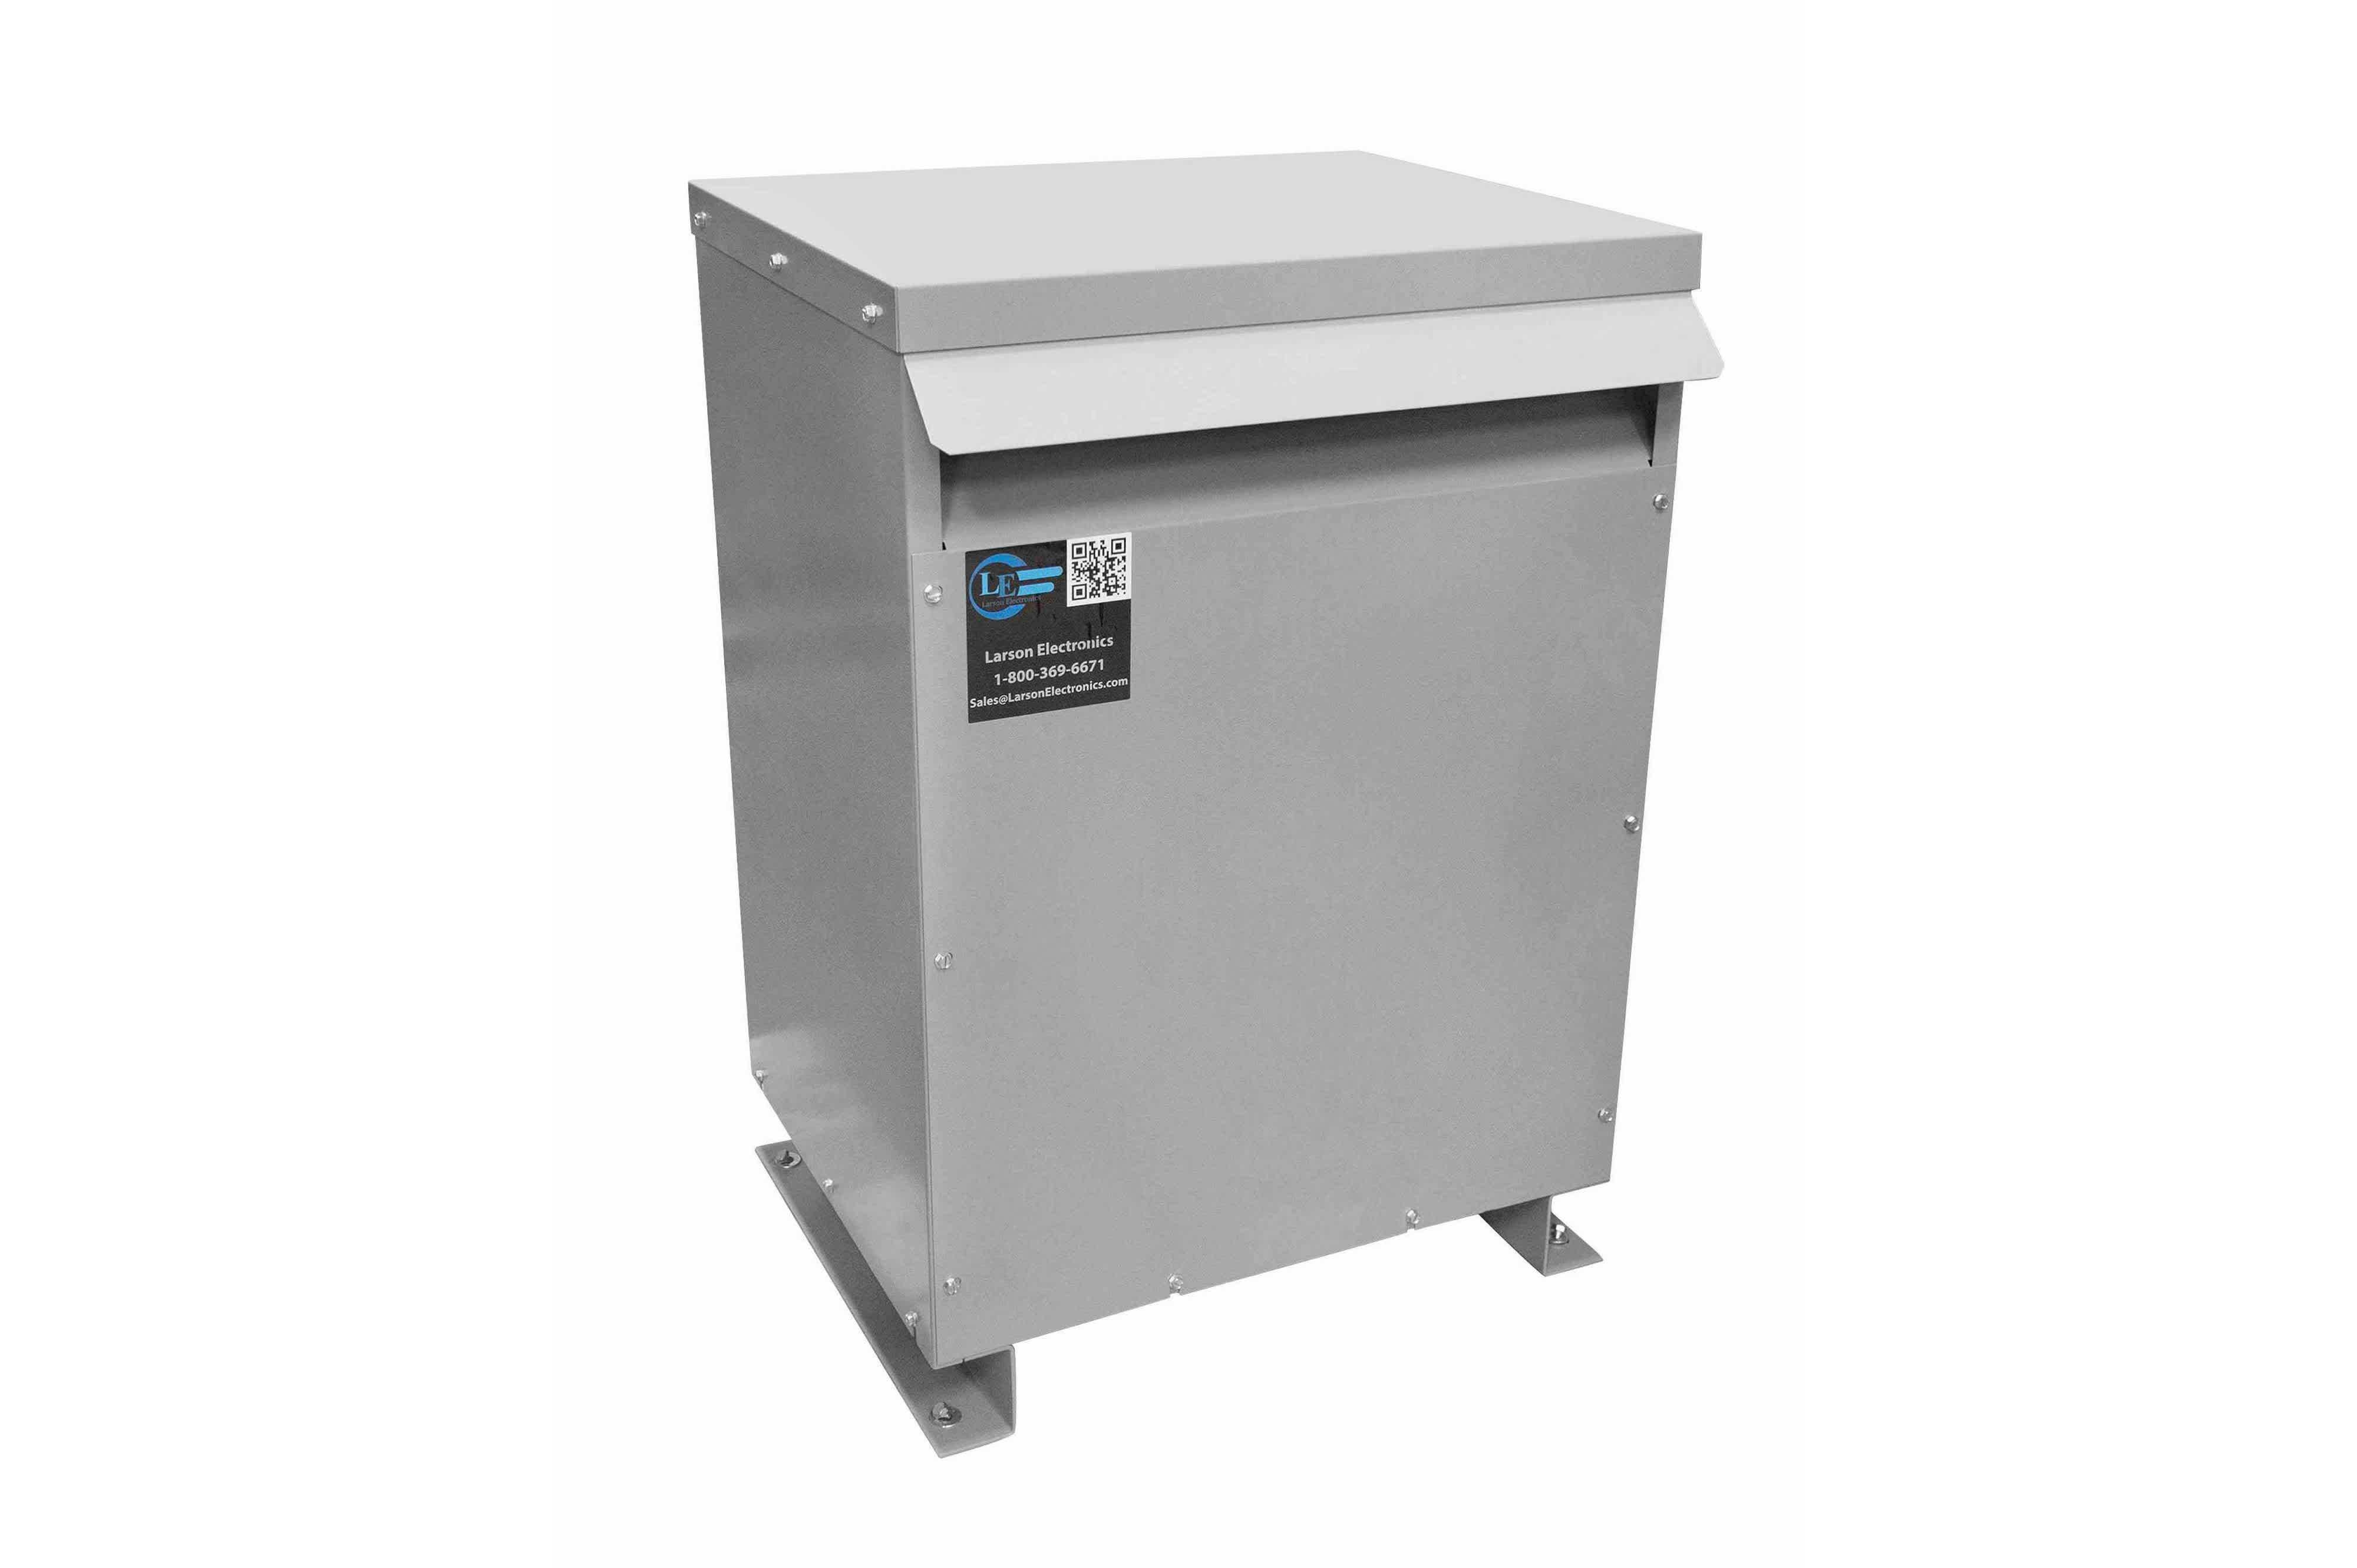 600 kVA 3PH Isolation Transformer, 480V Wye Primary, 575Y/332 Wye-N Secondary, N3R, Ventilated, 60 Hz